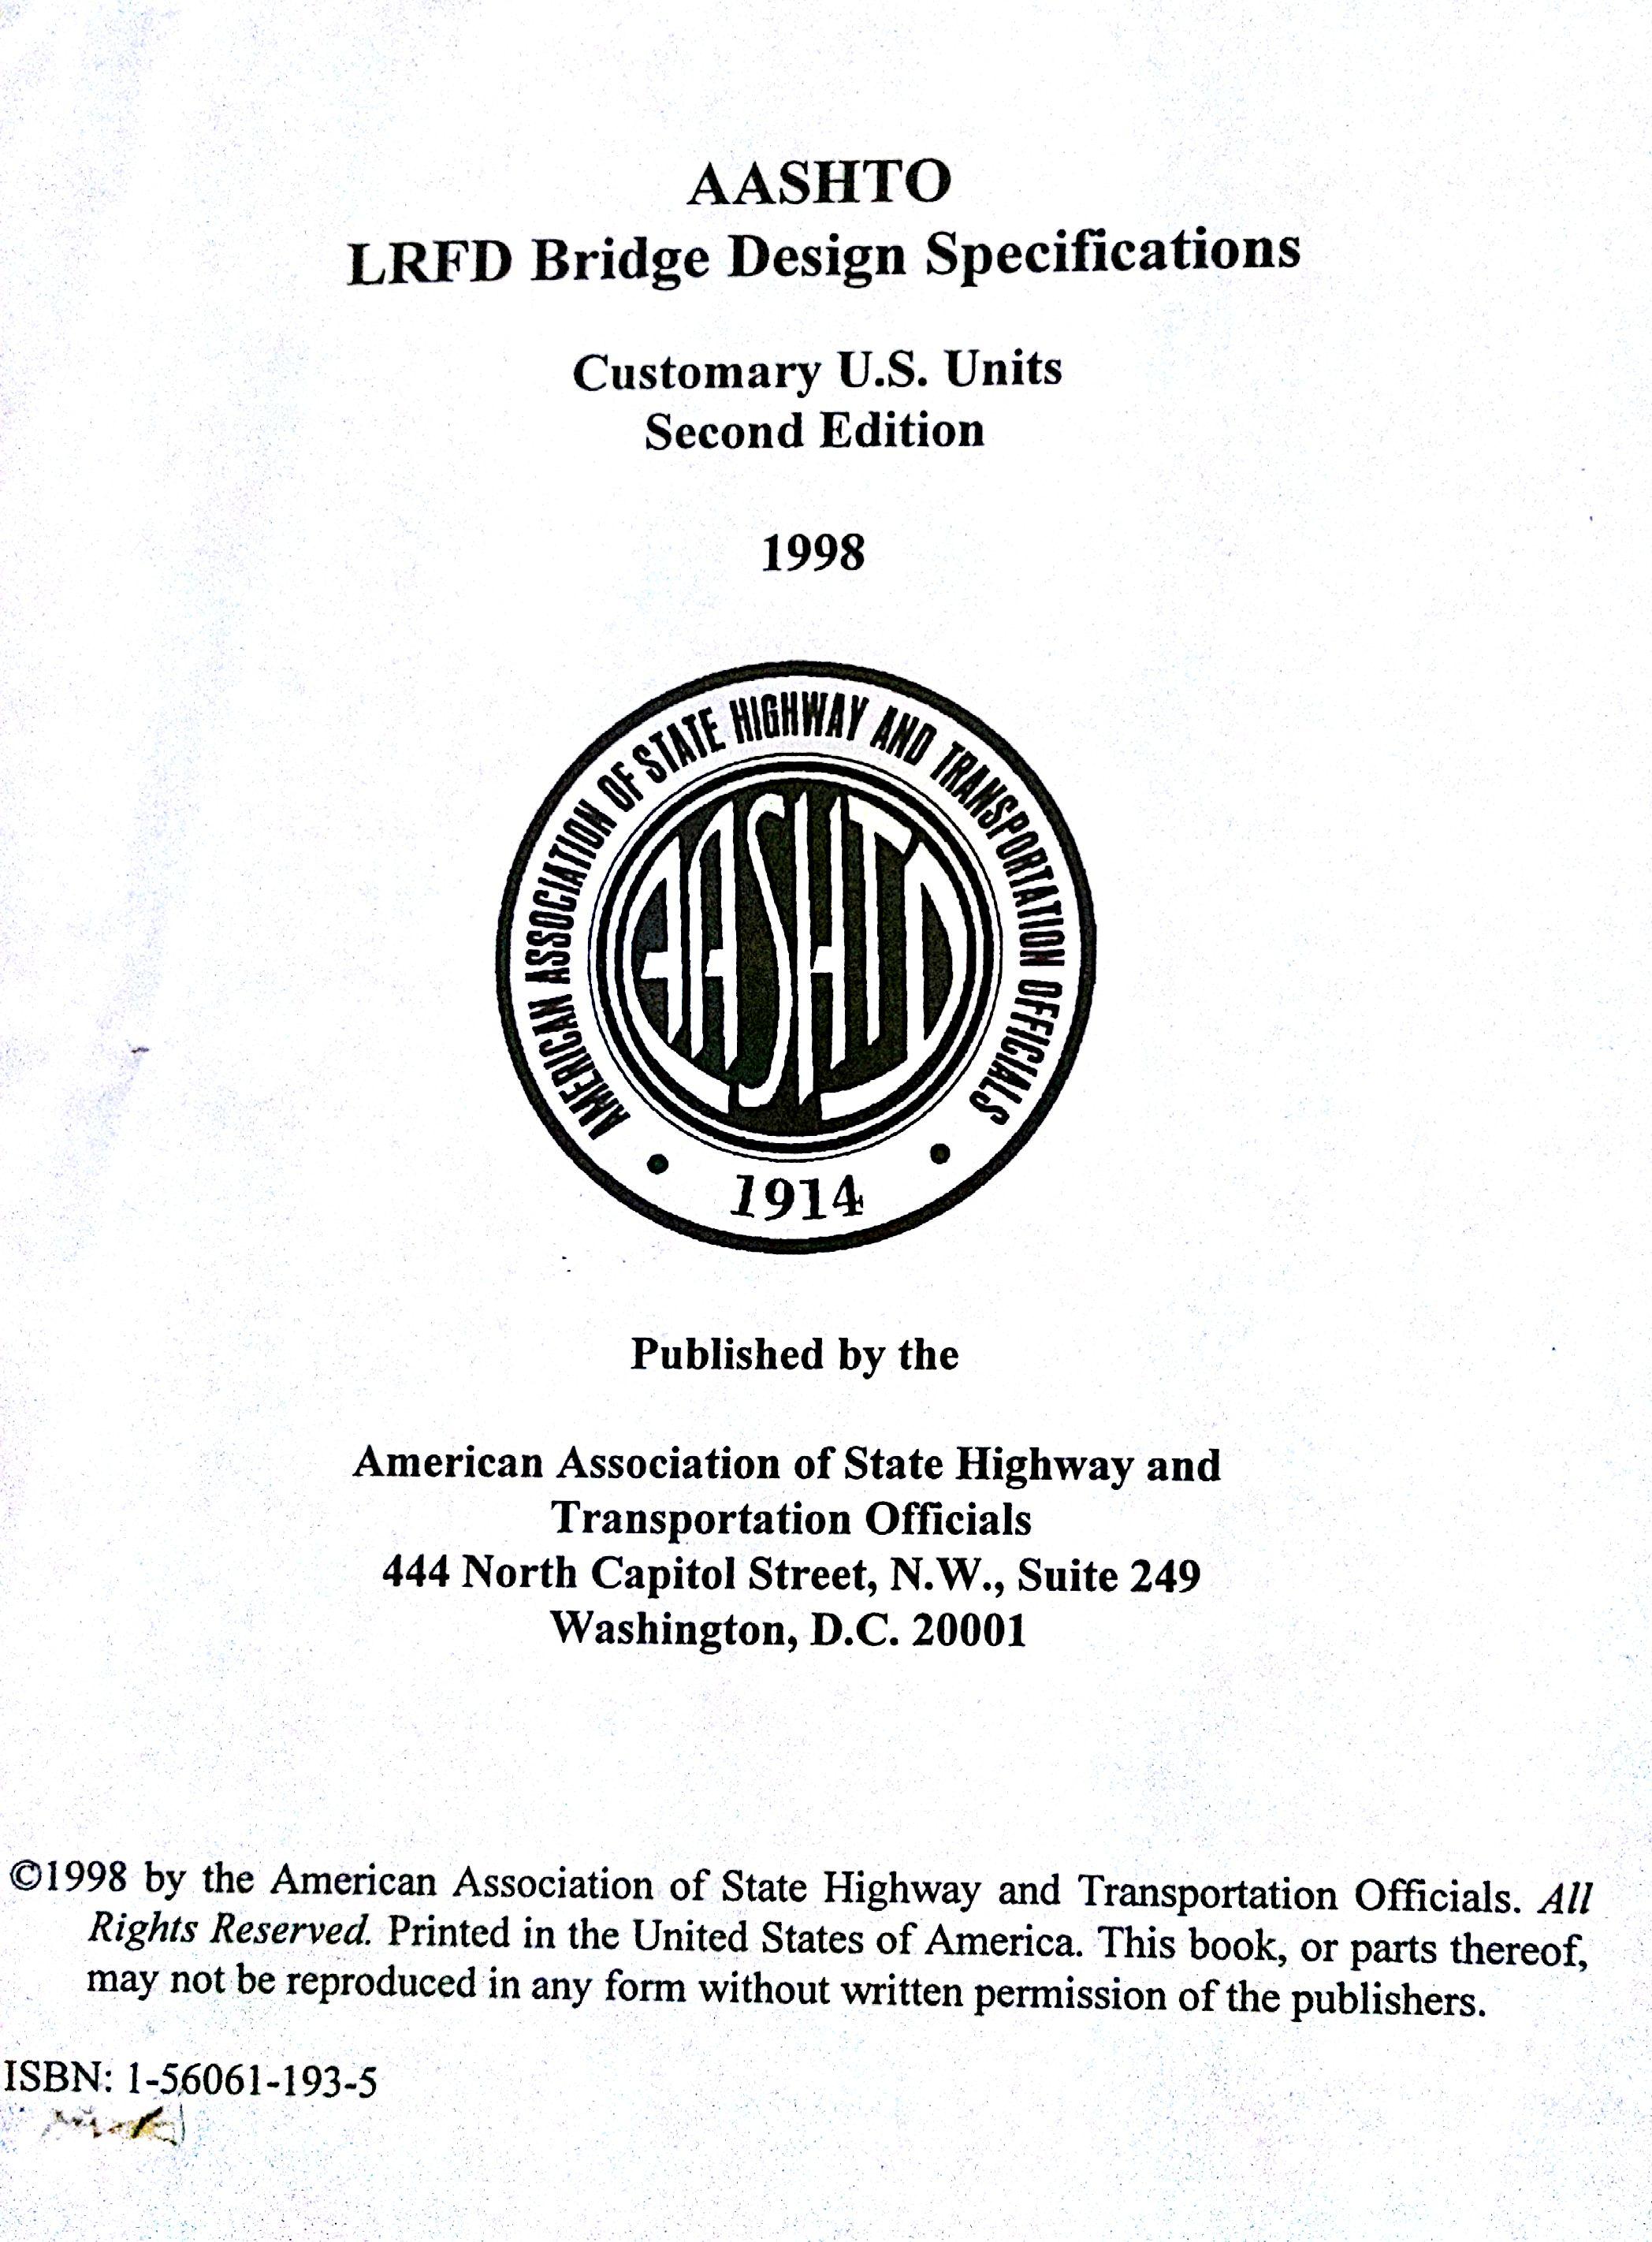 Staad AASHTO (LRFD) Design Code Version